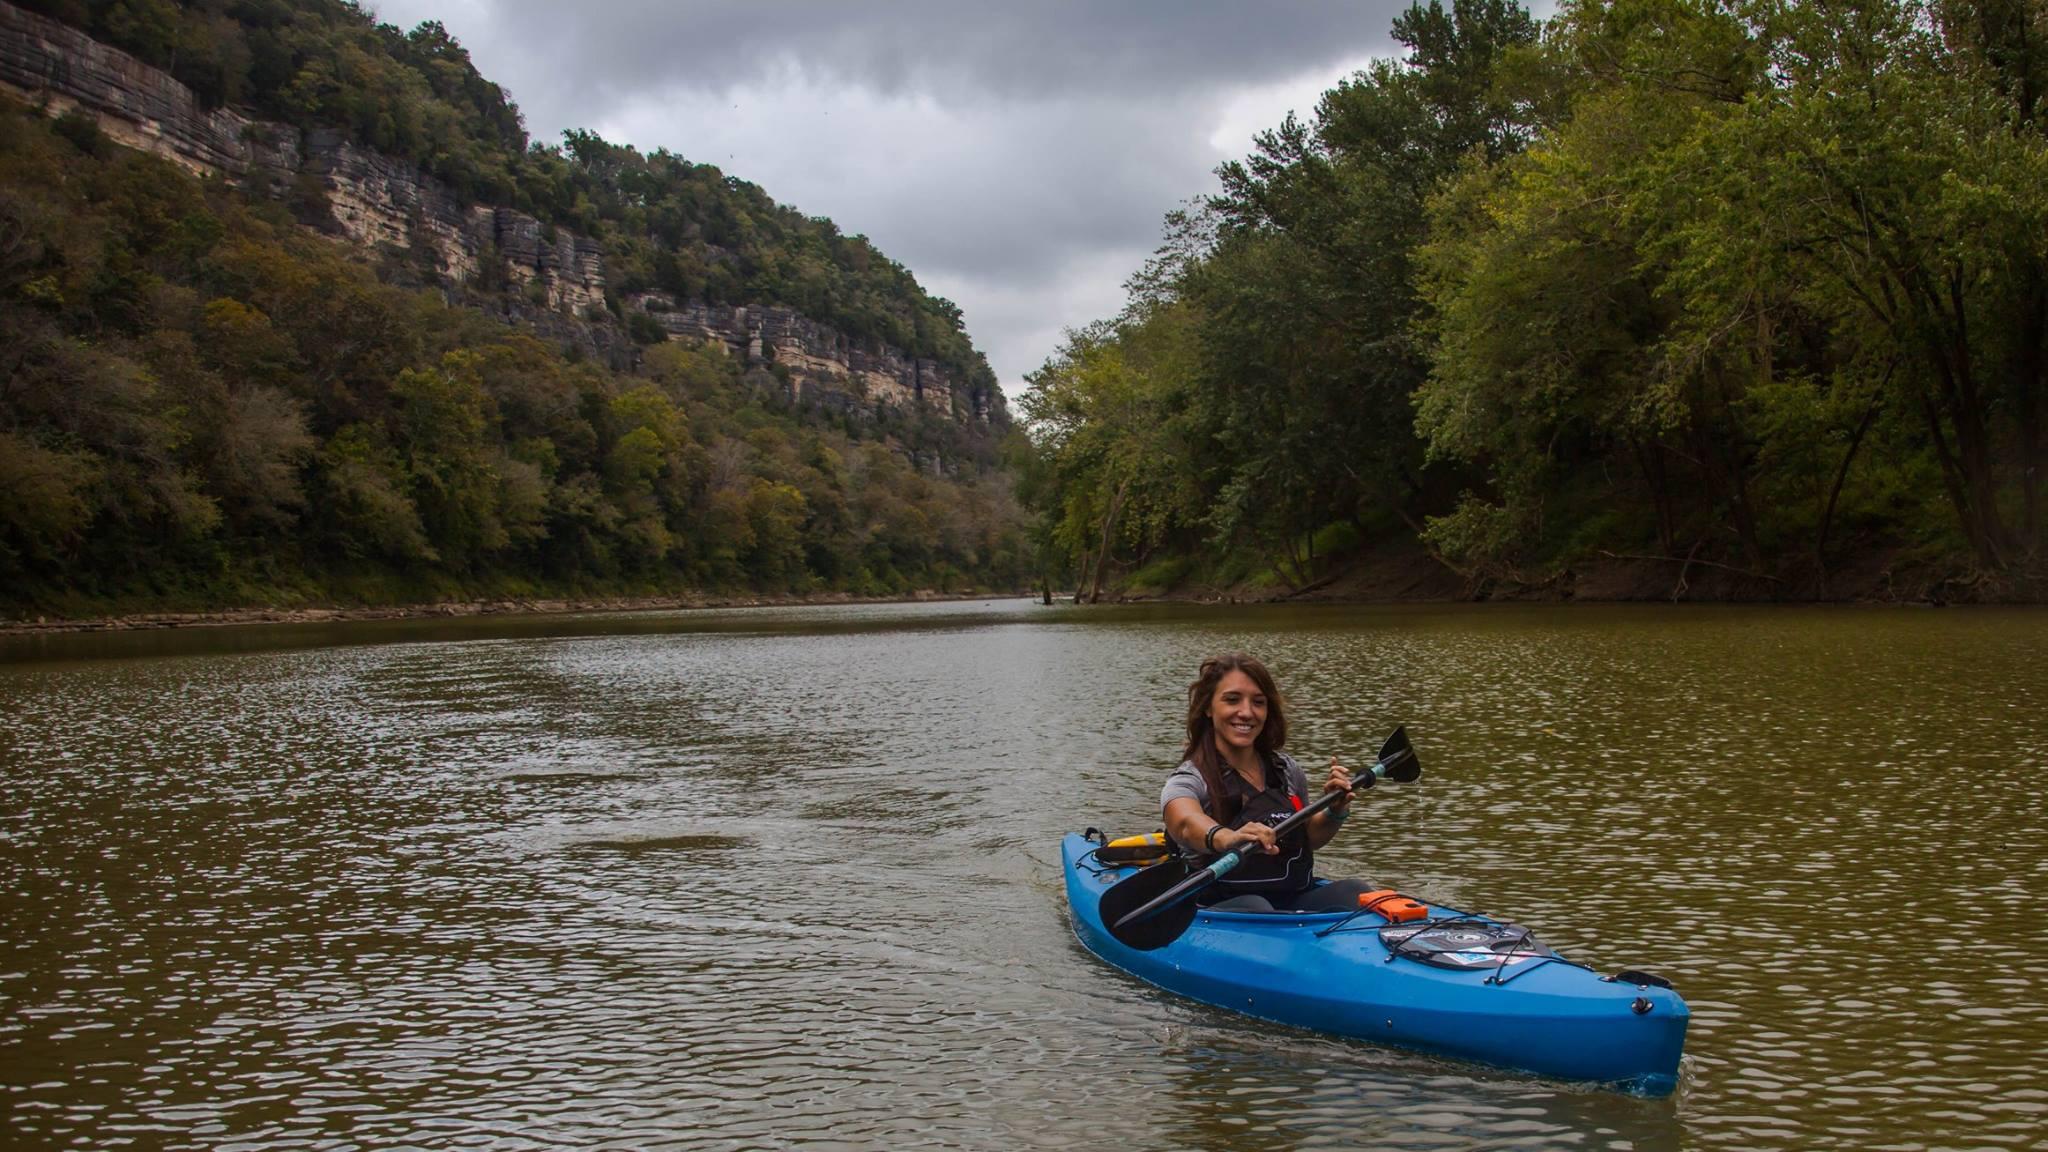 EKI's Shara Sumner, an ACA Level II Kayak Instructor. Photo via Gerry James